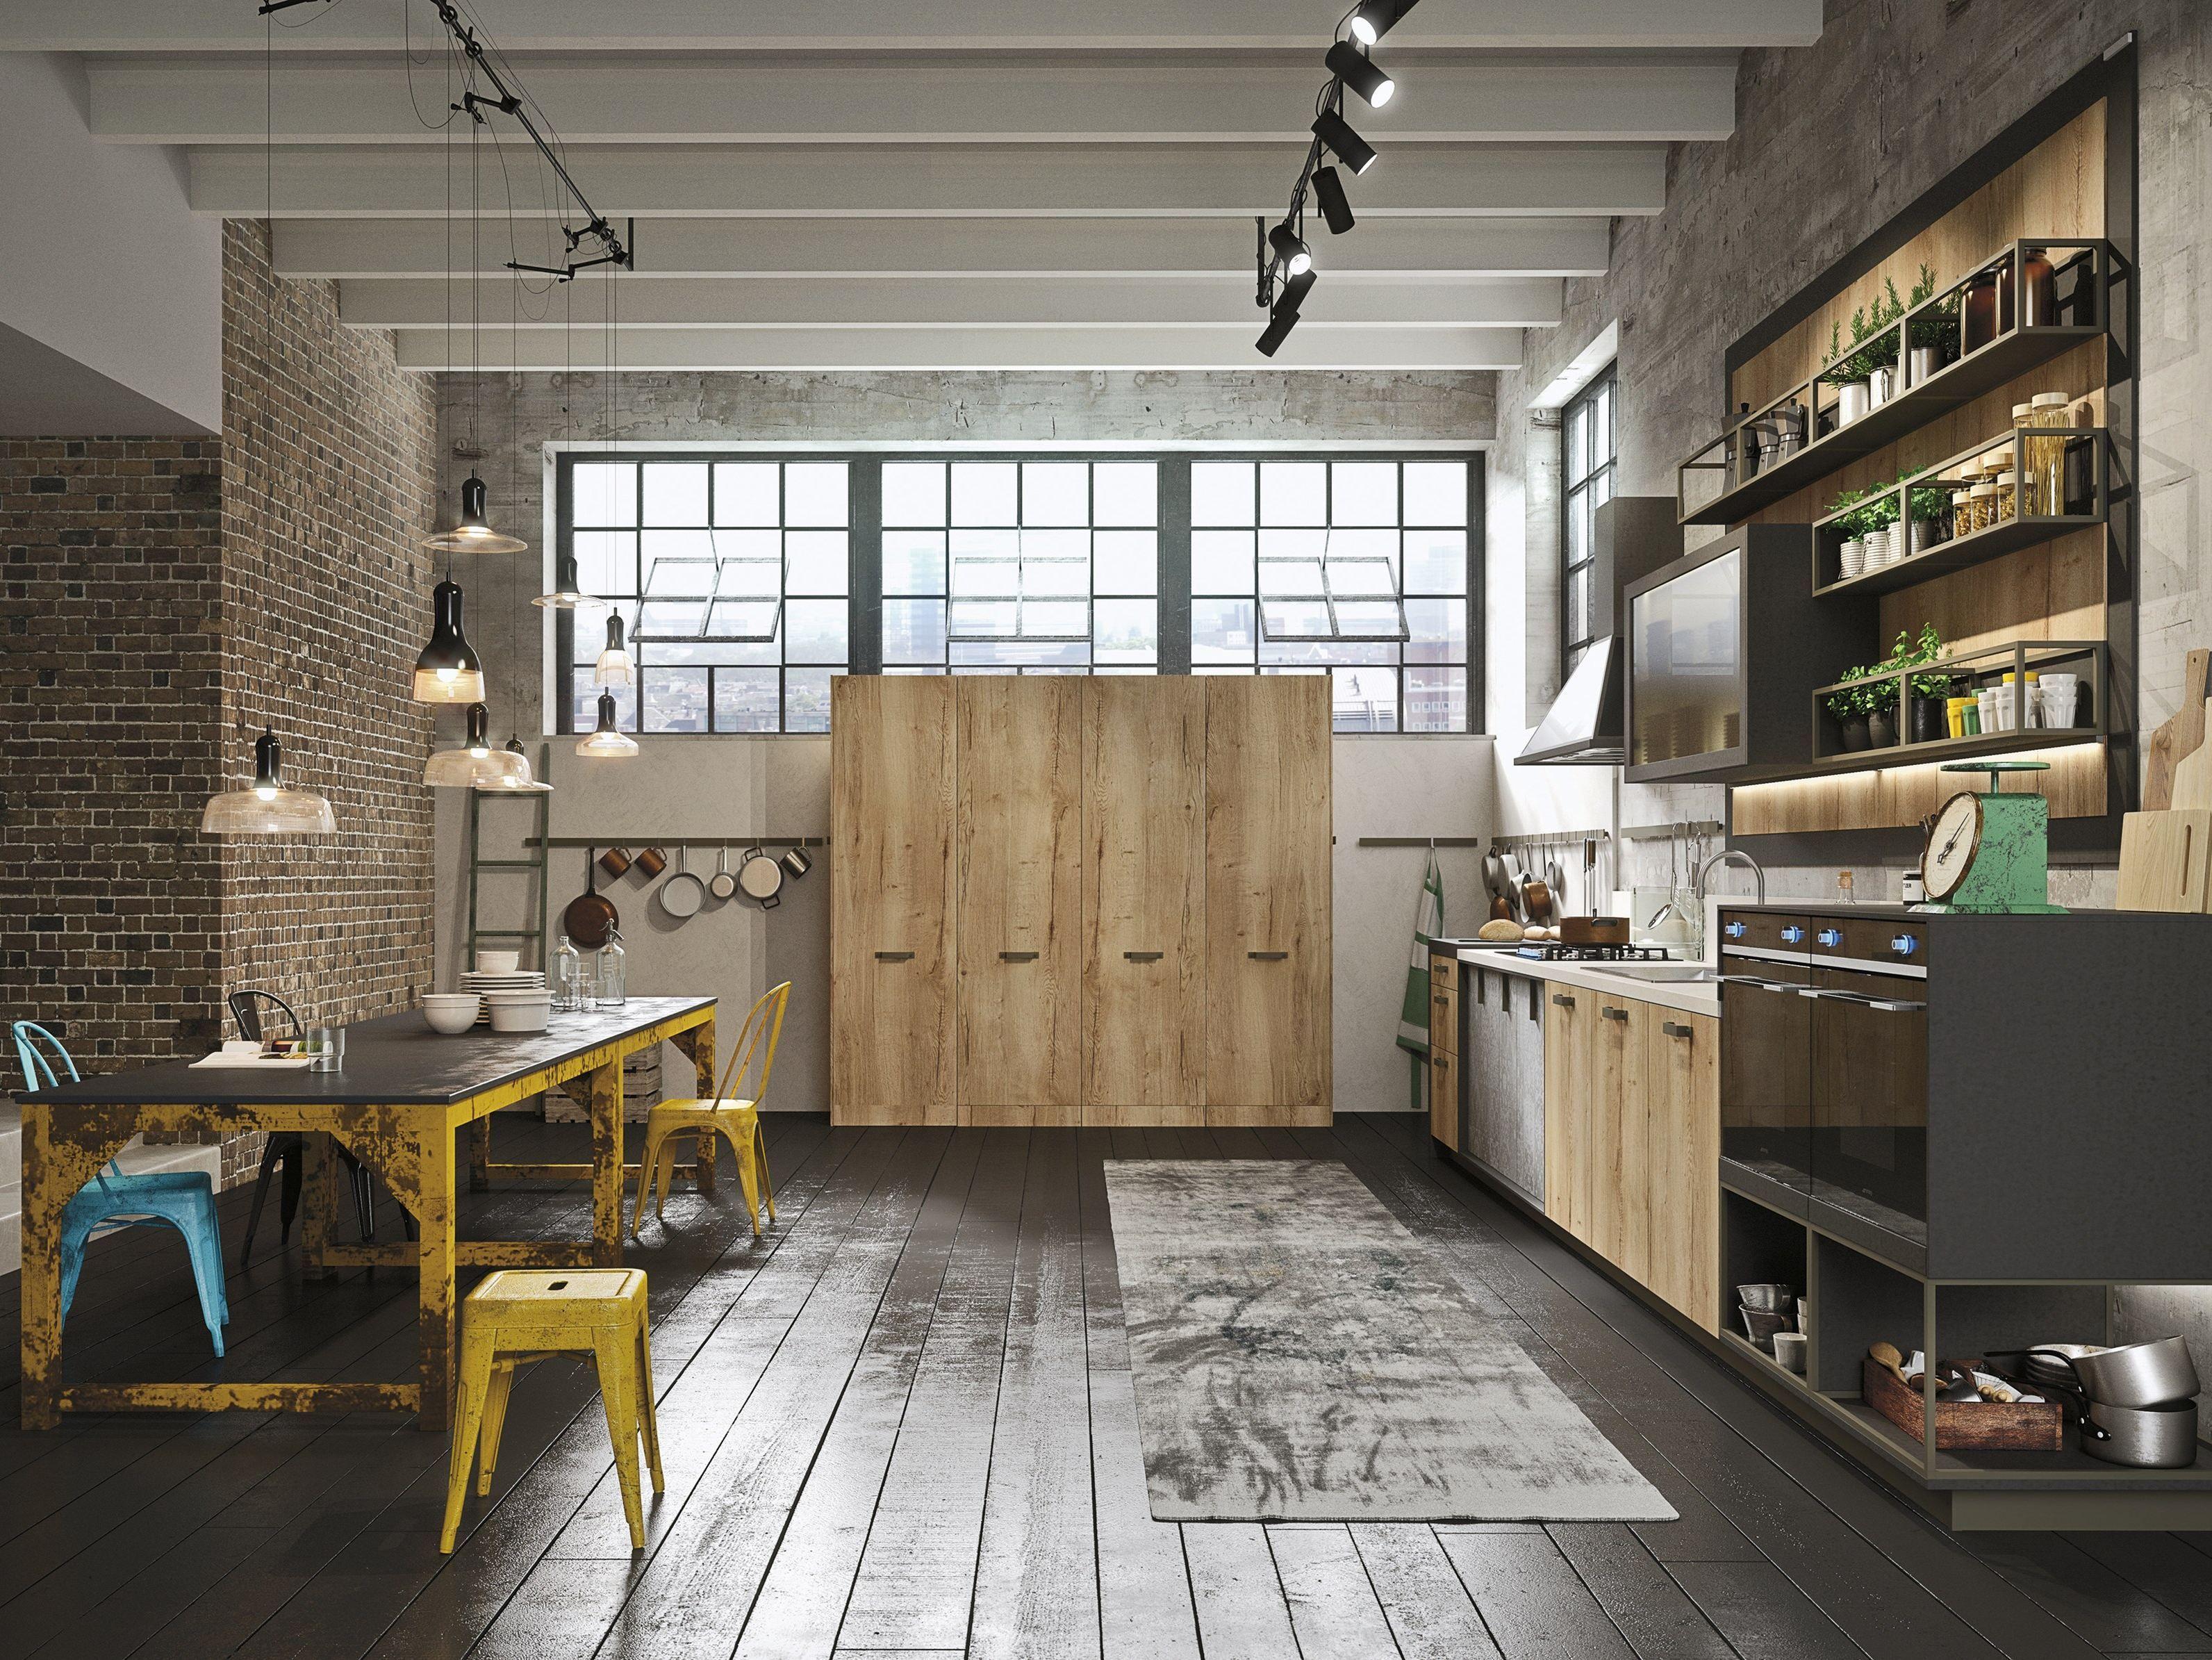 LOFT Linear kitchen by Snaidero design Michele Marcon